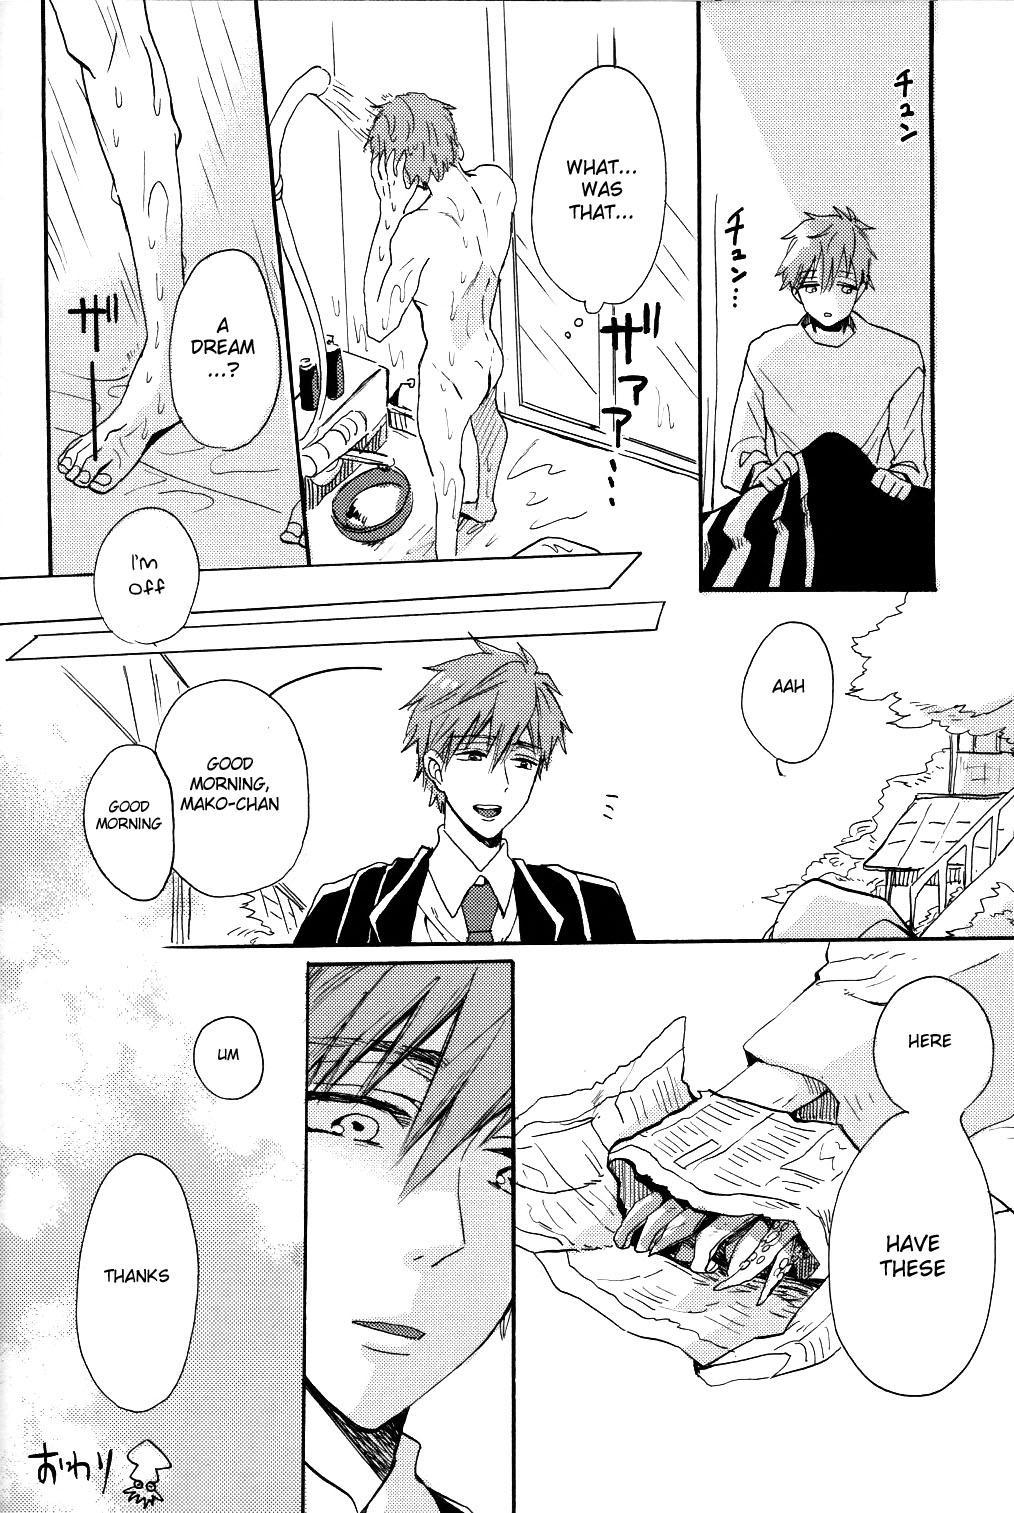 [hn (pirori)] Mako-chan jana-Ika!? (Free!) [English] 16